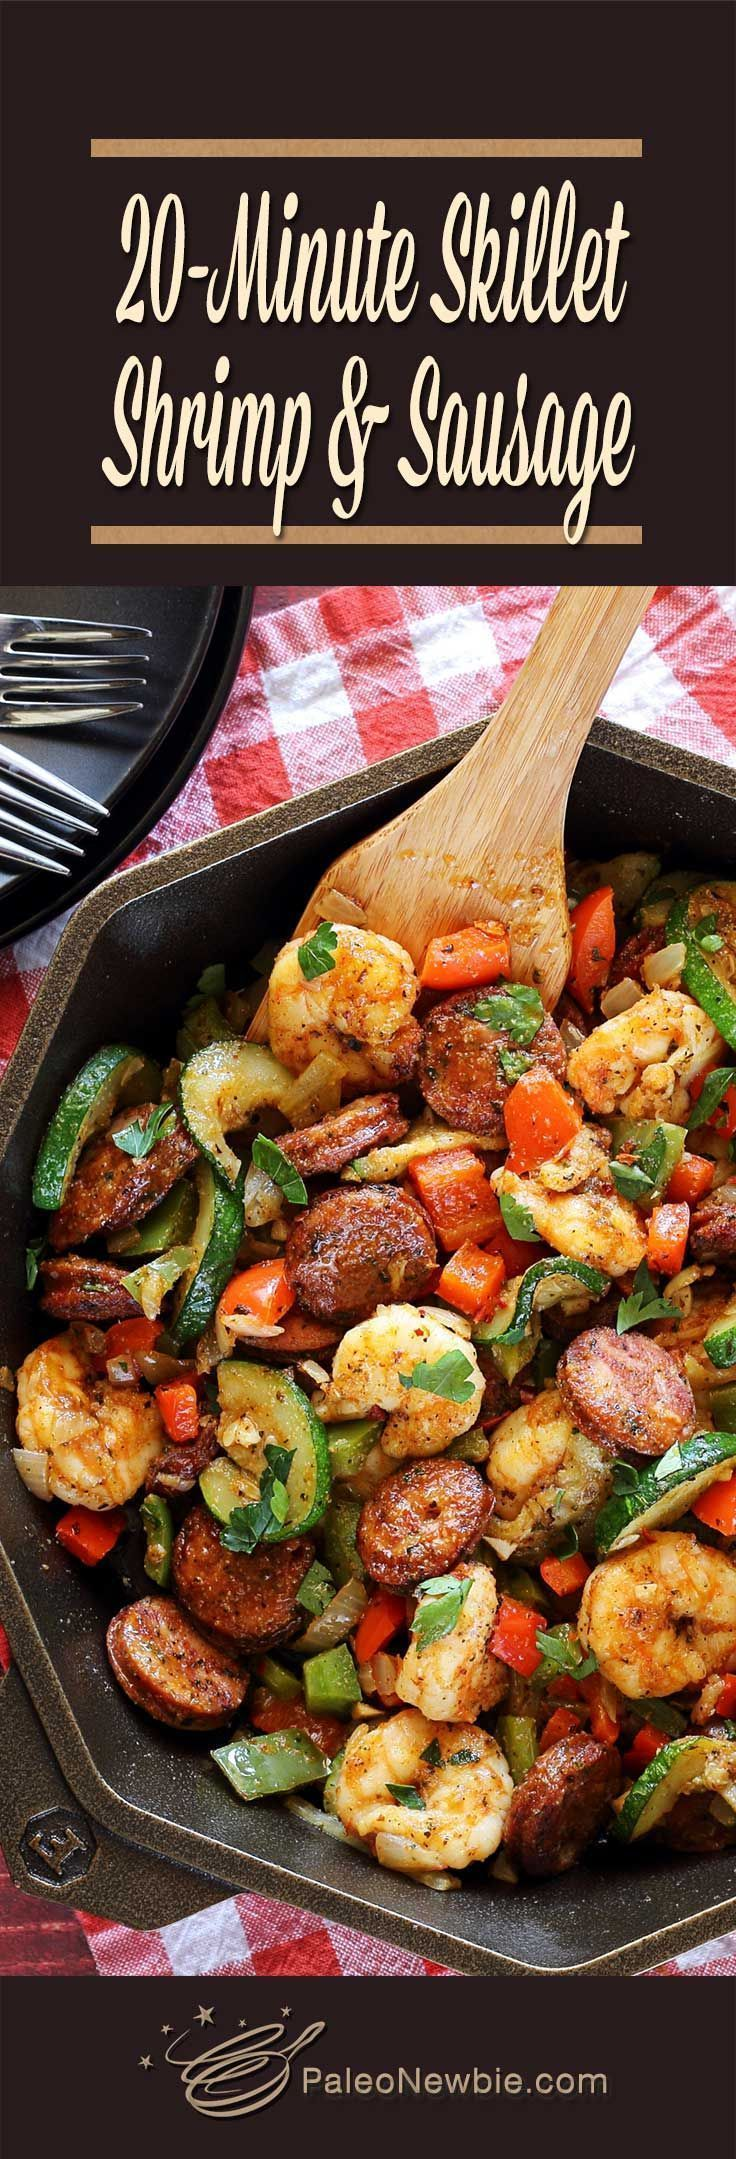 Photo of 20-Minute Shrimp & Sausage Paleo Skillet Meal Recipe | Paleo Newbie